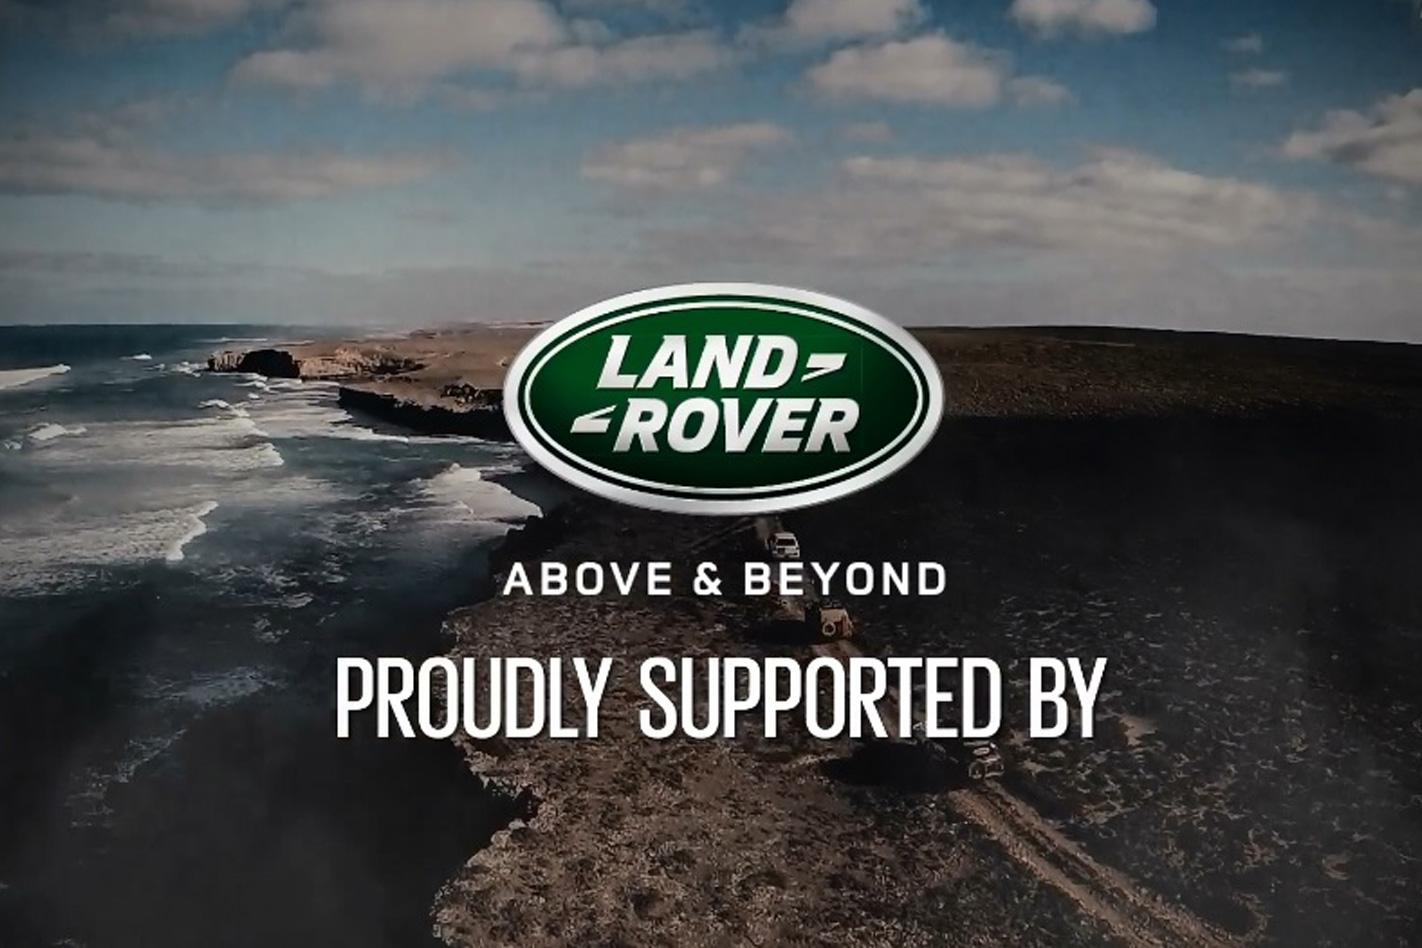 Landrover -bb -030615